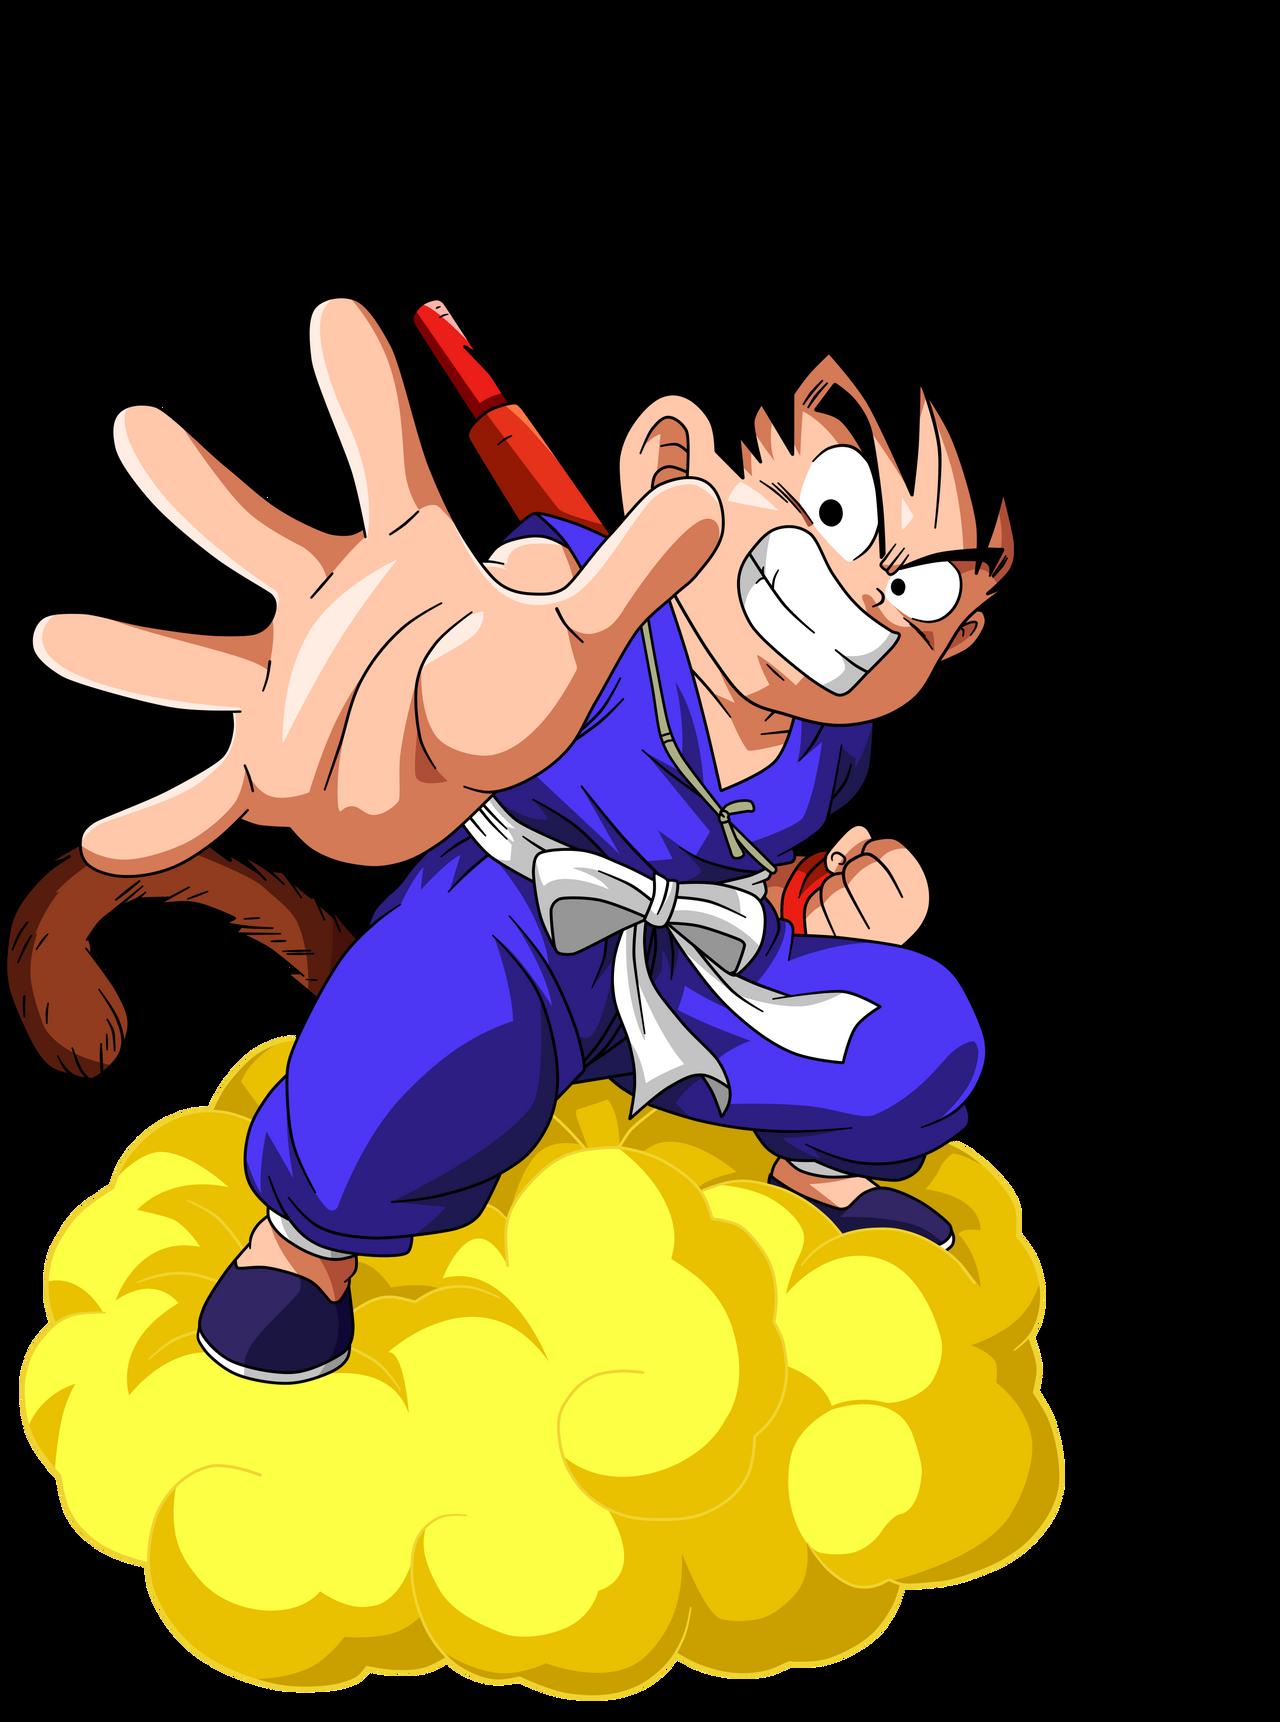 Dragon Ball Kid Goku 43 By Superjmanplay2 On Deviantart Kid Goku Dragon Ball Image Dragon Ball